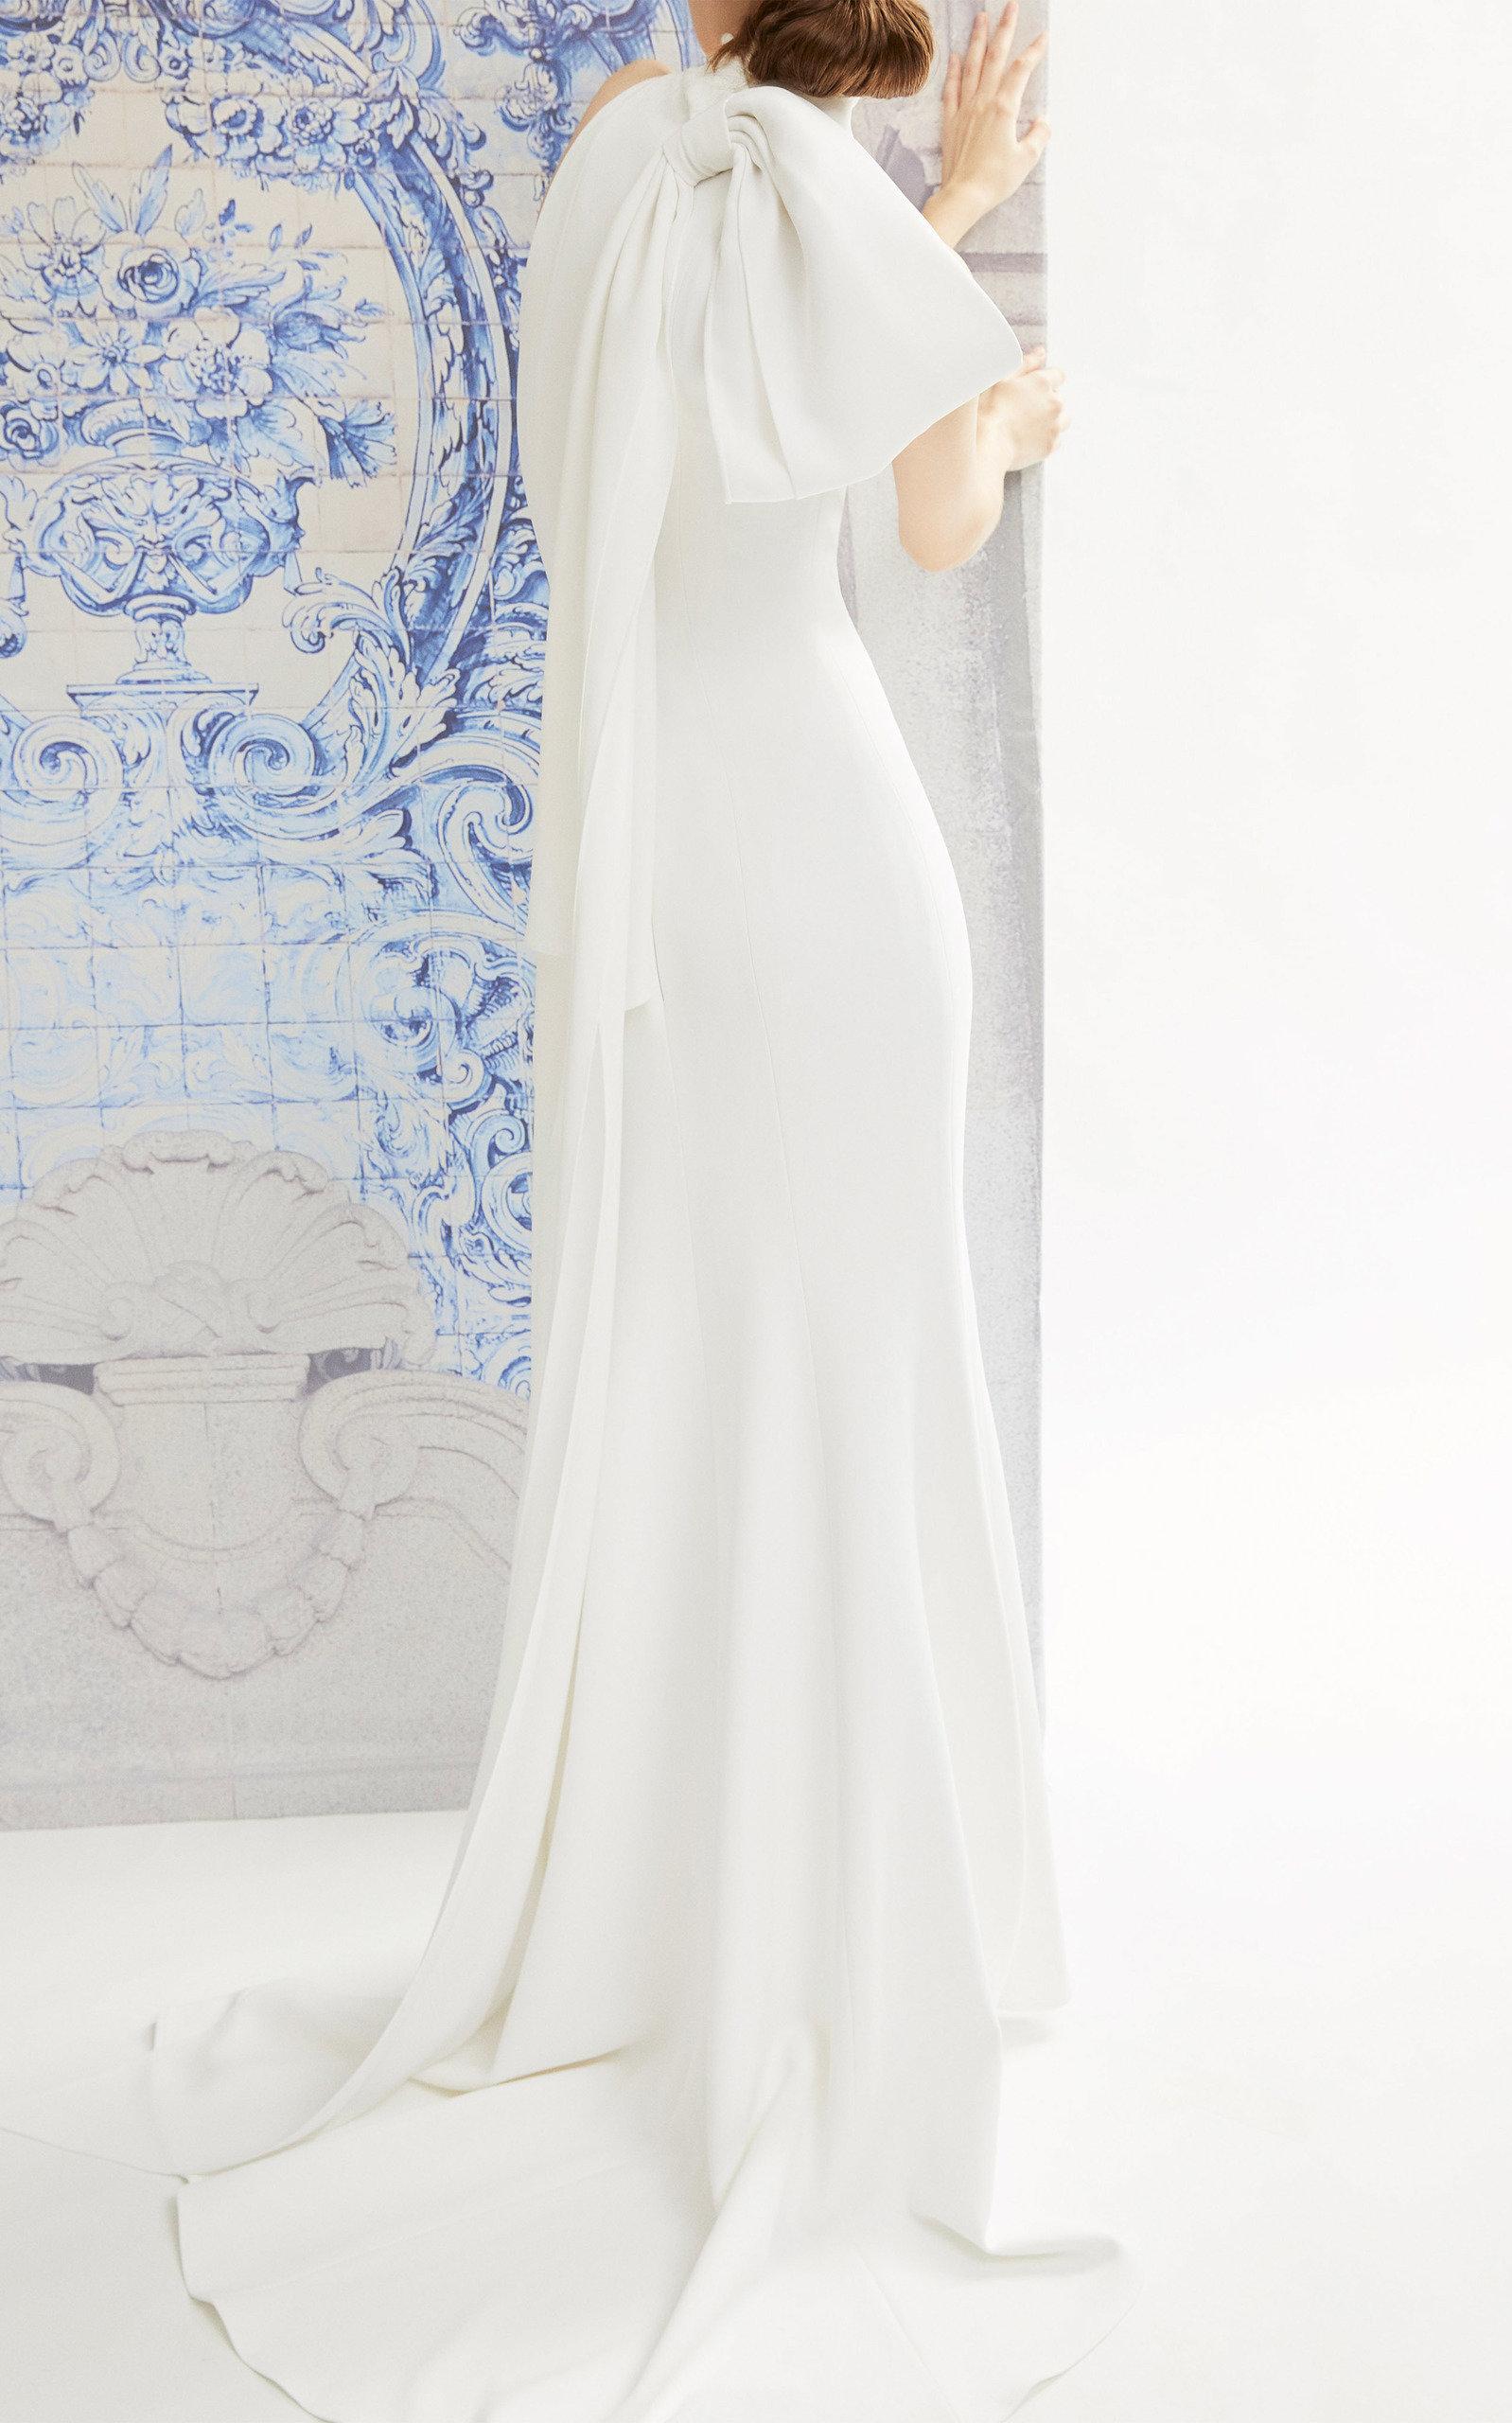 Carolina Herrera Wedding Dress.Iris Bow Detailed Crepe Halterneck Gown